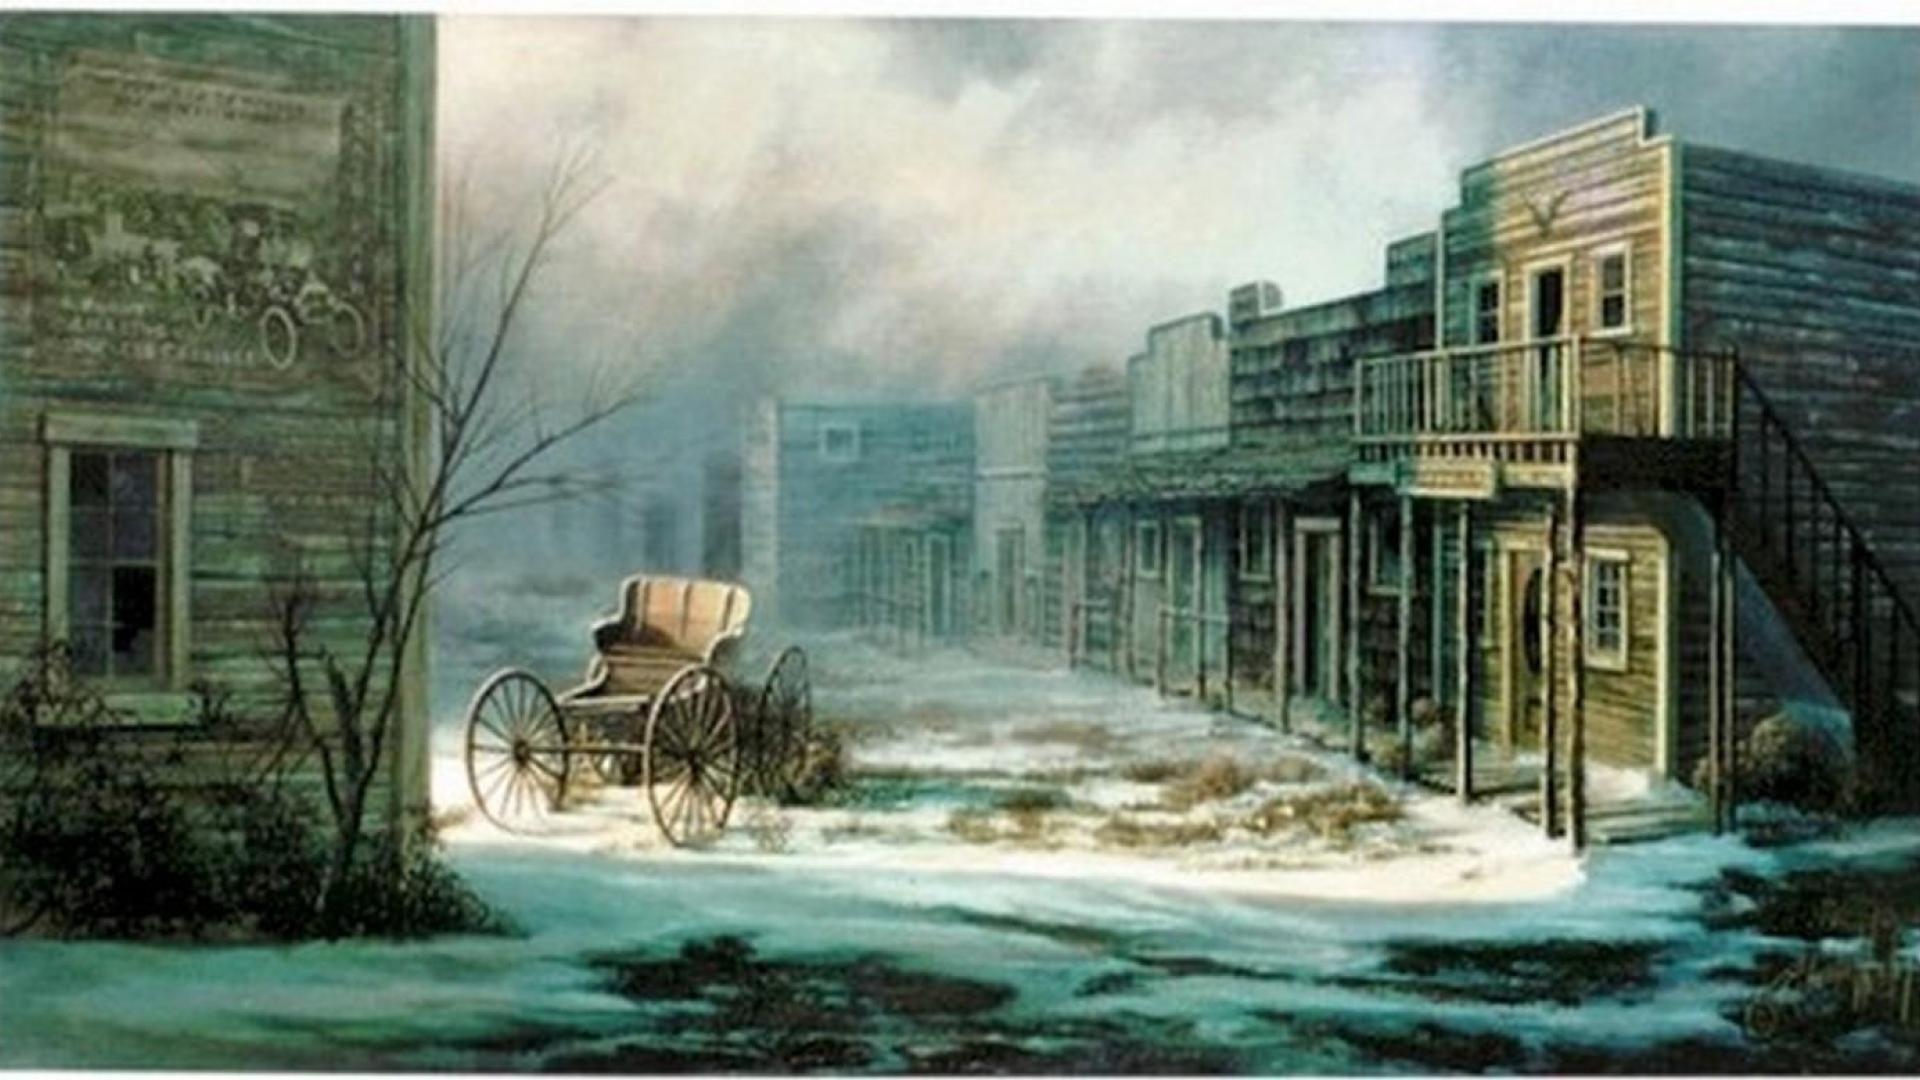 ghost town wallpaper hd | hd wallpapers | pinterest | ghost towns